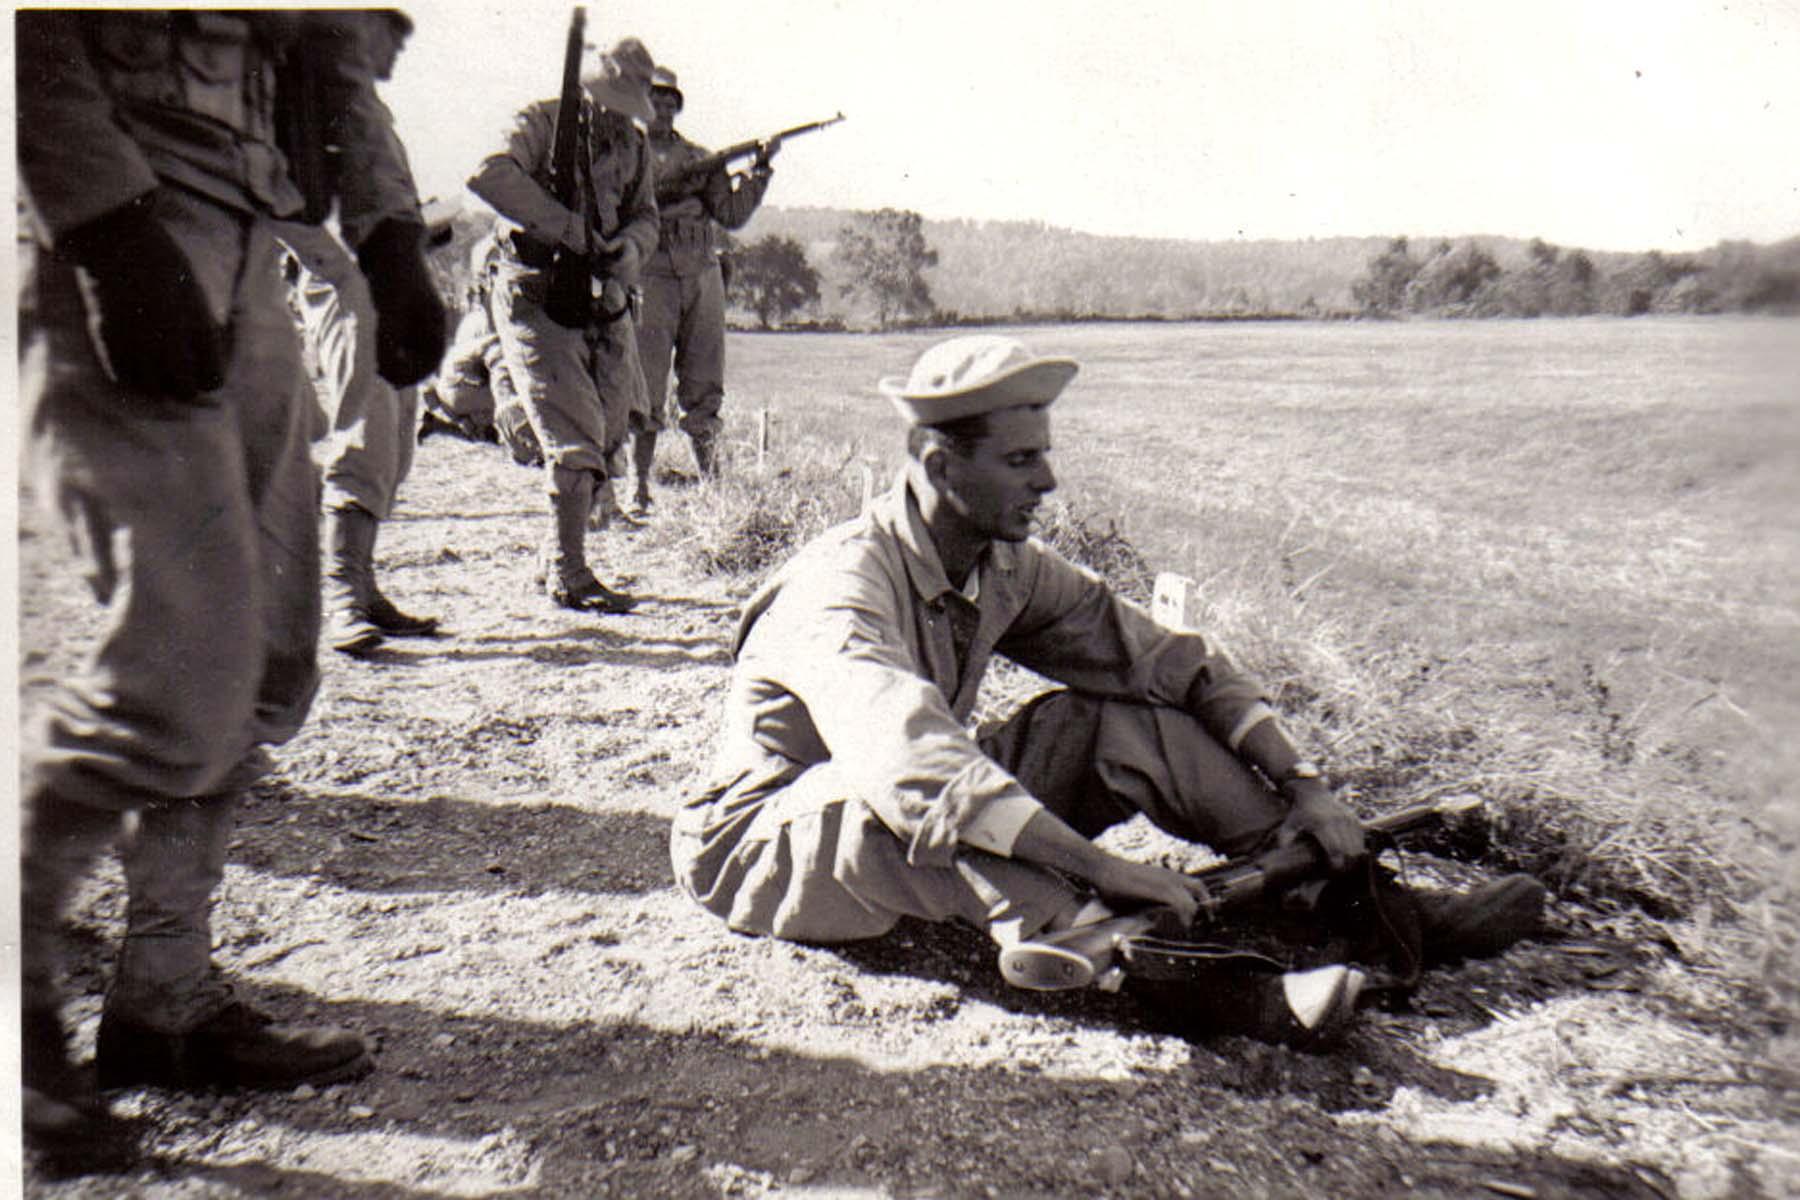 A17 Ft_ Leonard Wood_ MO - Corporal Mark Zelenovich_ platoon leader of squad #1 sitting on firing line